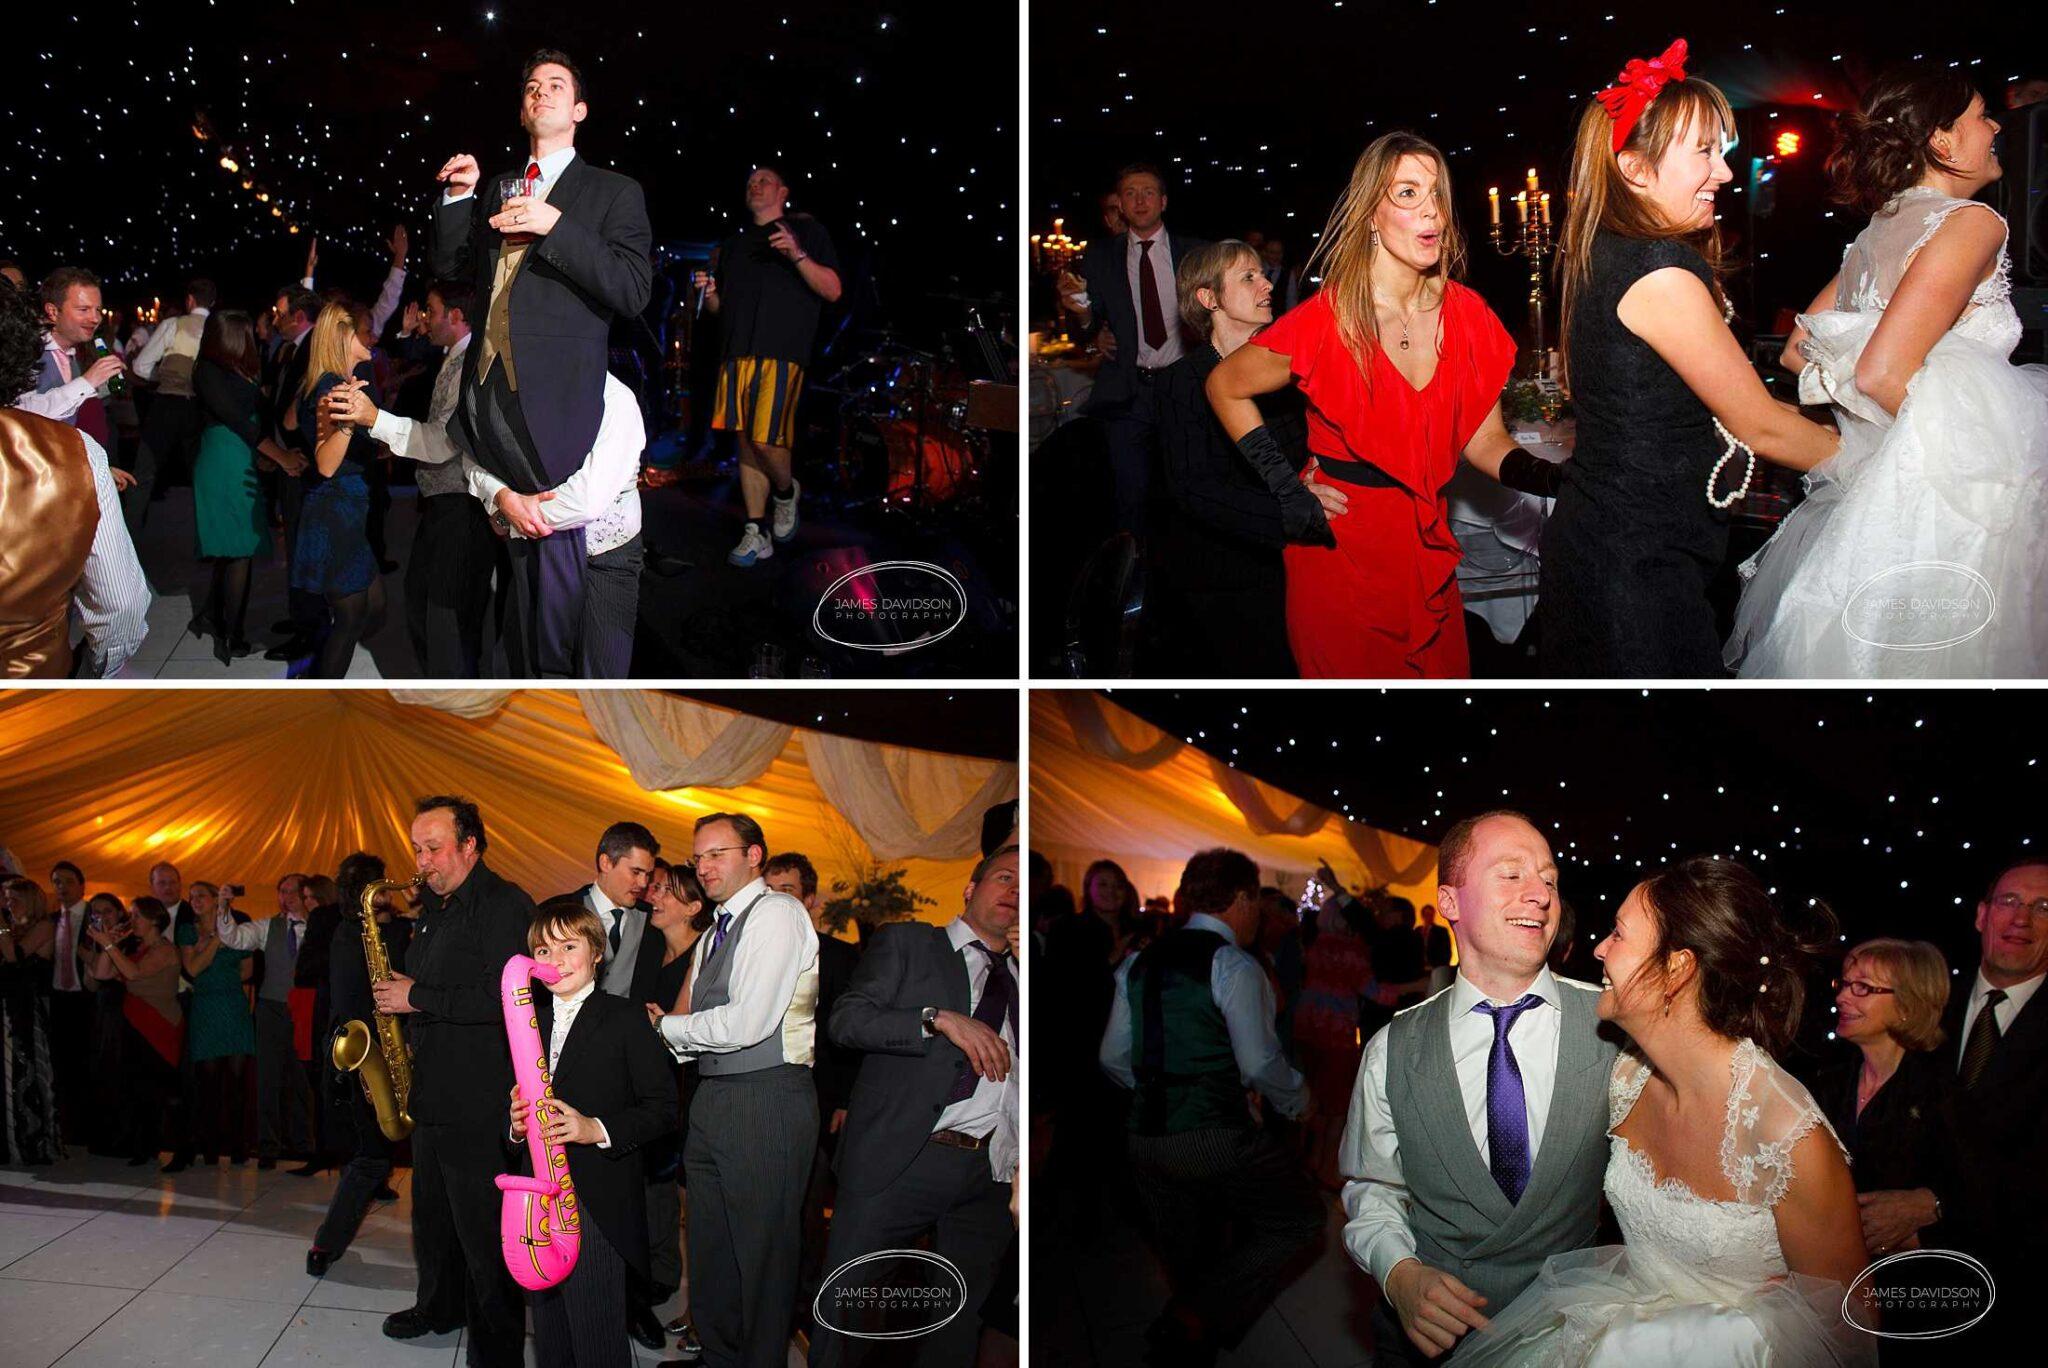 huddersfield-wedding-photography-067